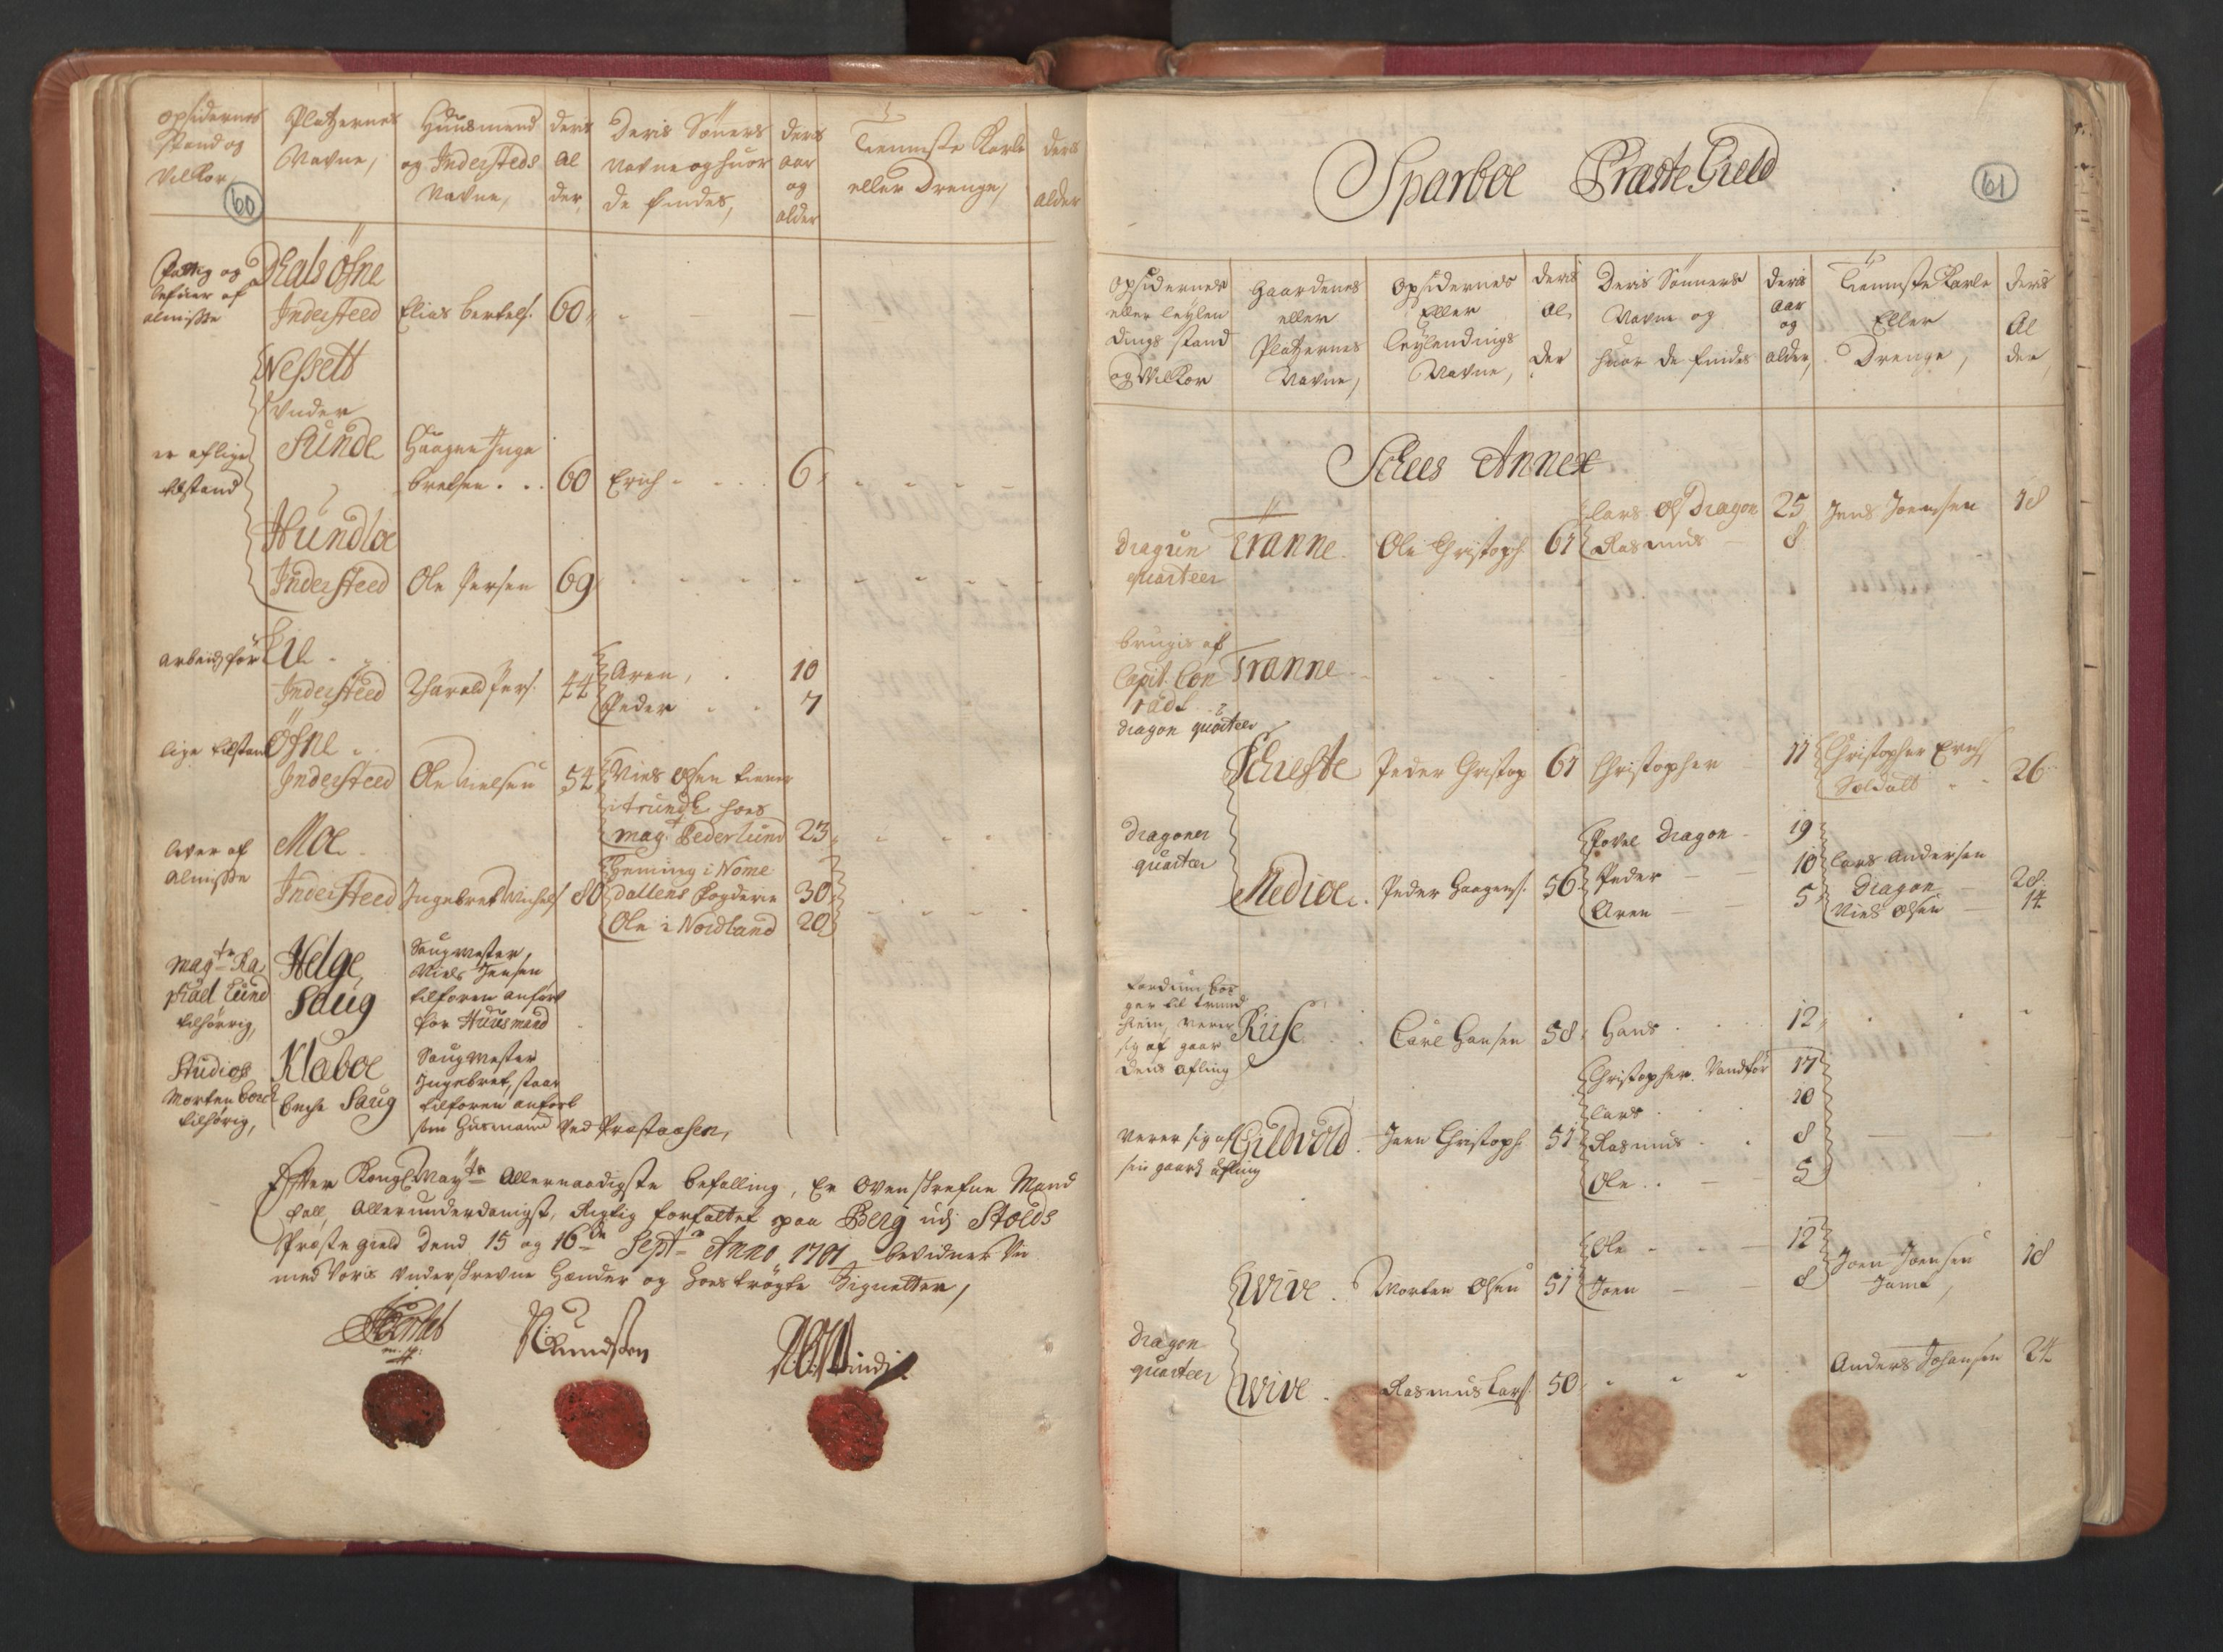 RA, Manntallet 1701, nr. 15: Inderøy fogderi og Namdal fogderi, 1701, s. 60-61